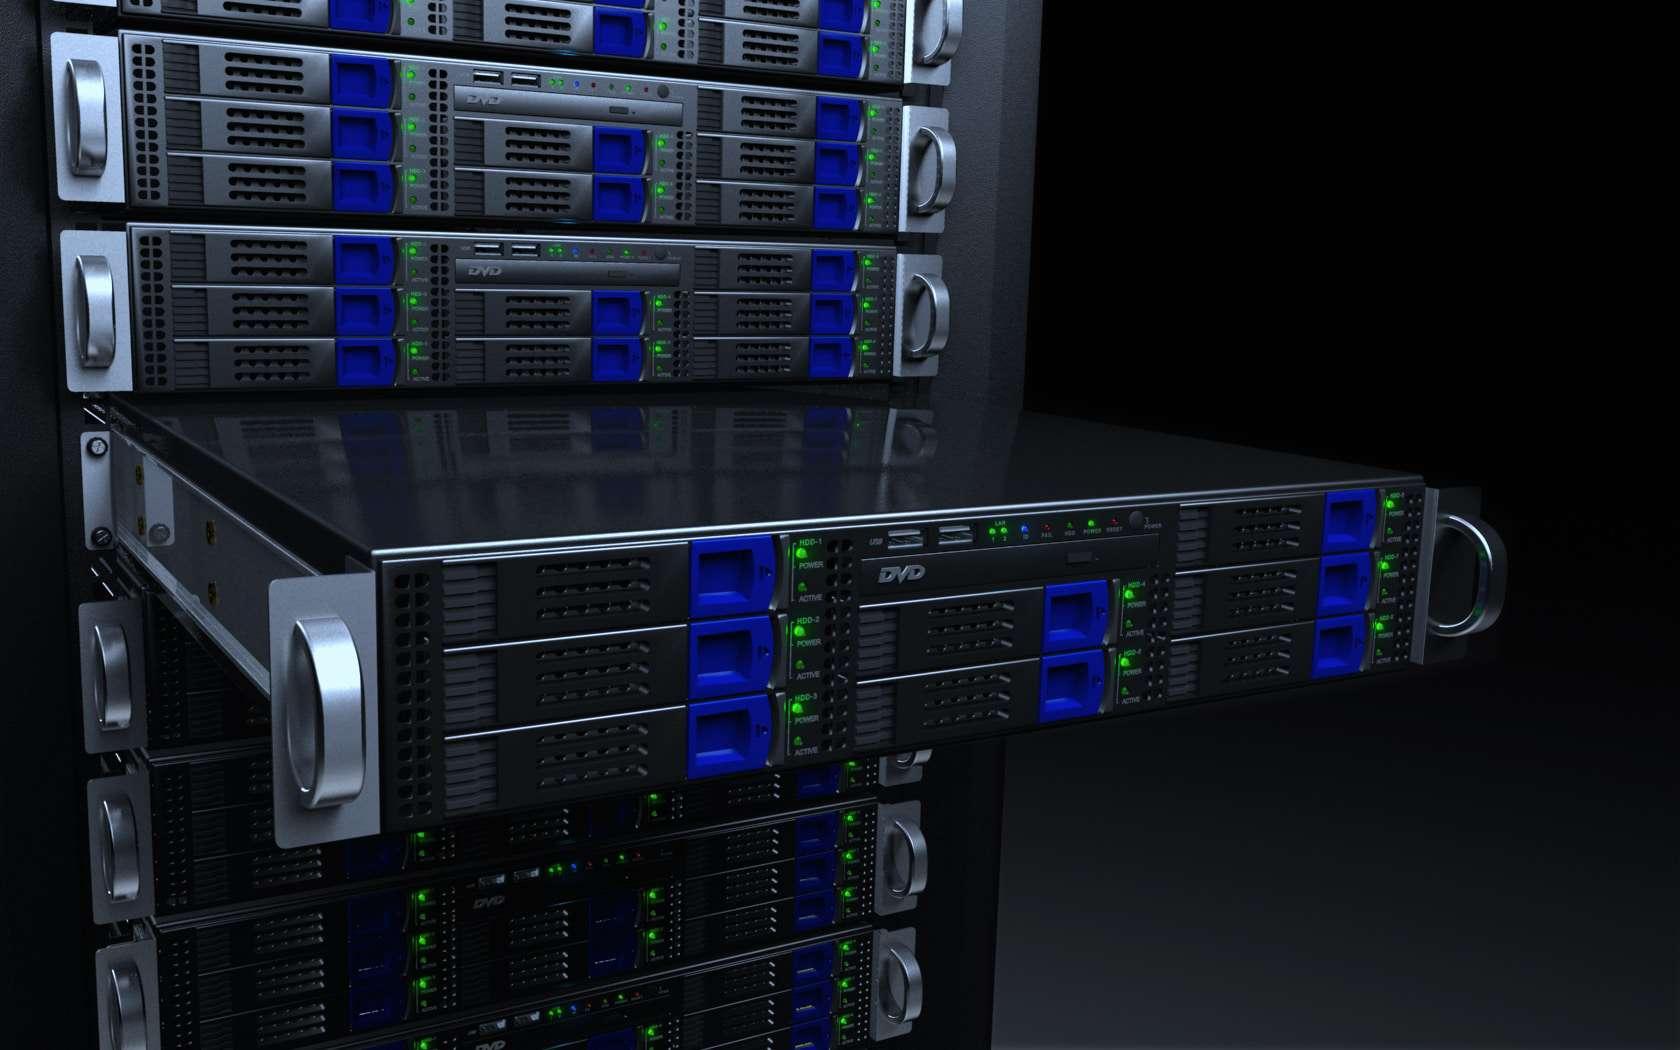 Server Rack Blue